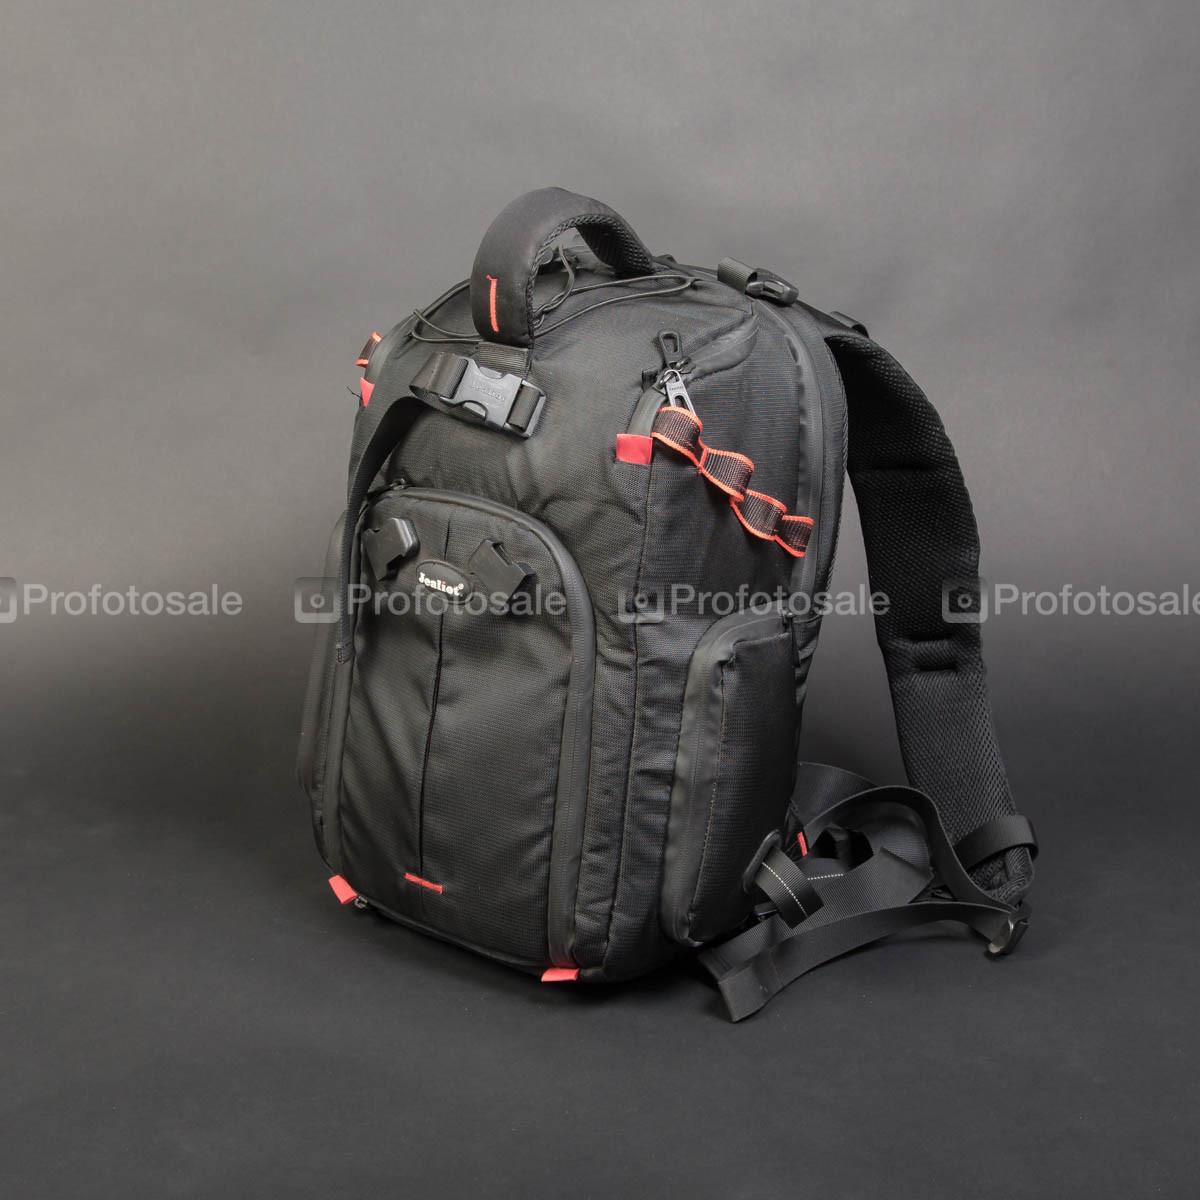 Jealiot Skyline-3195 Professional